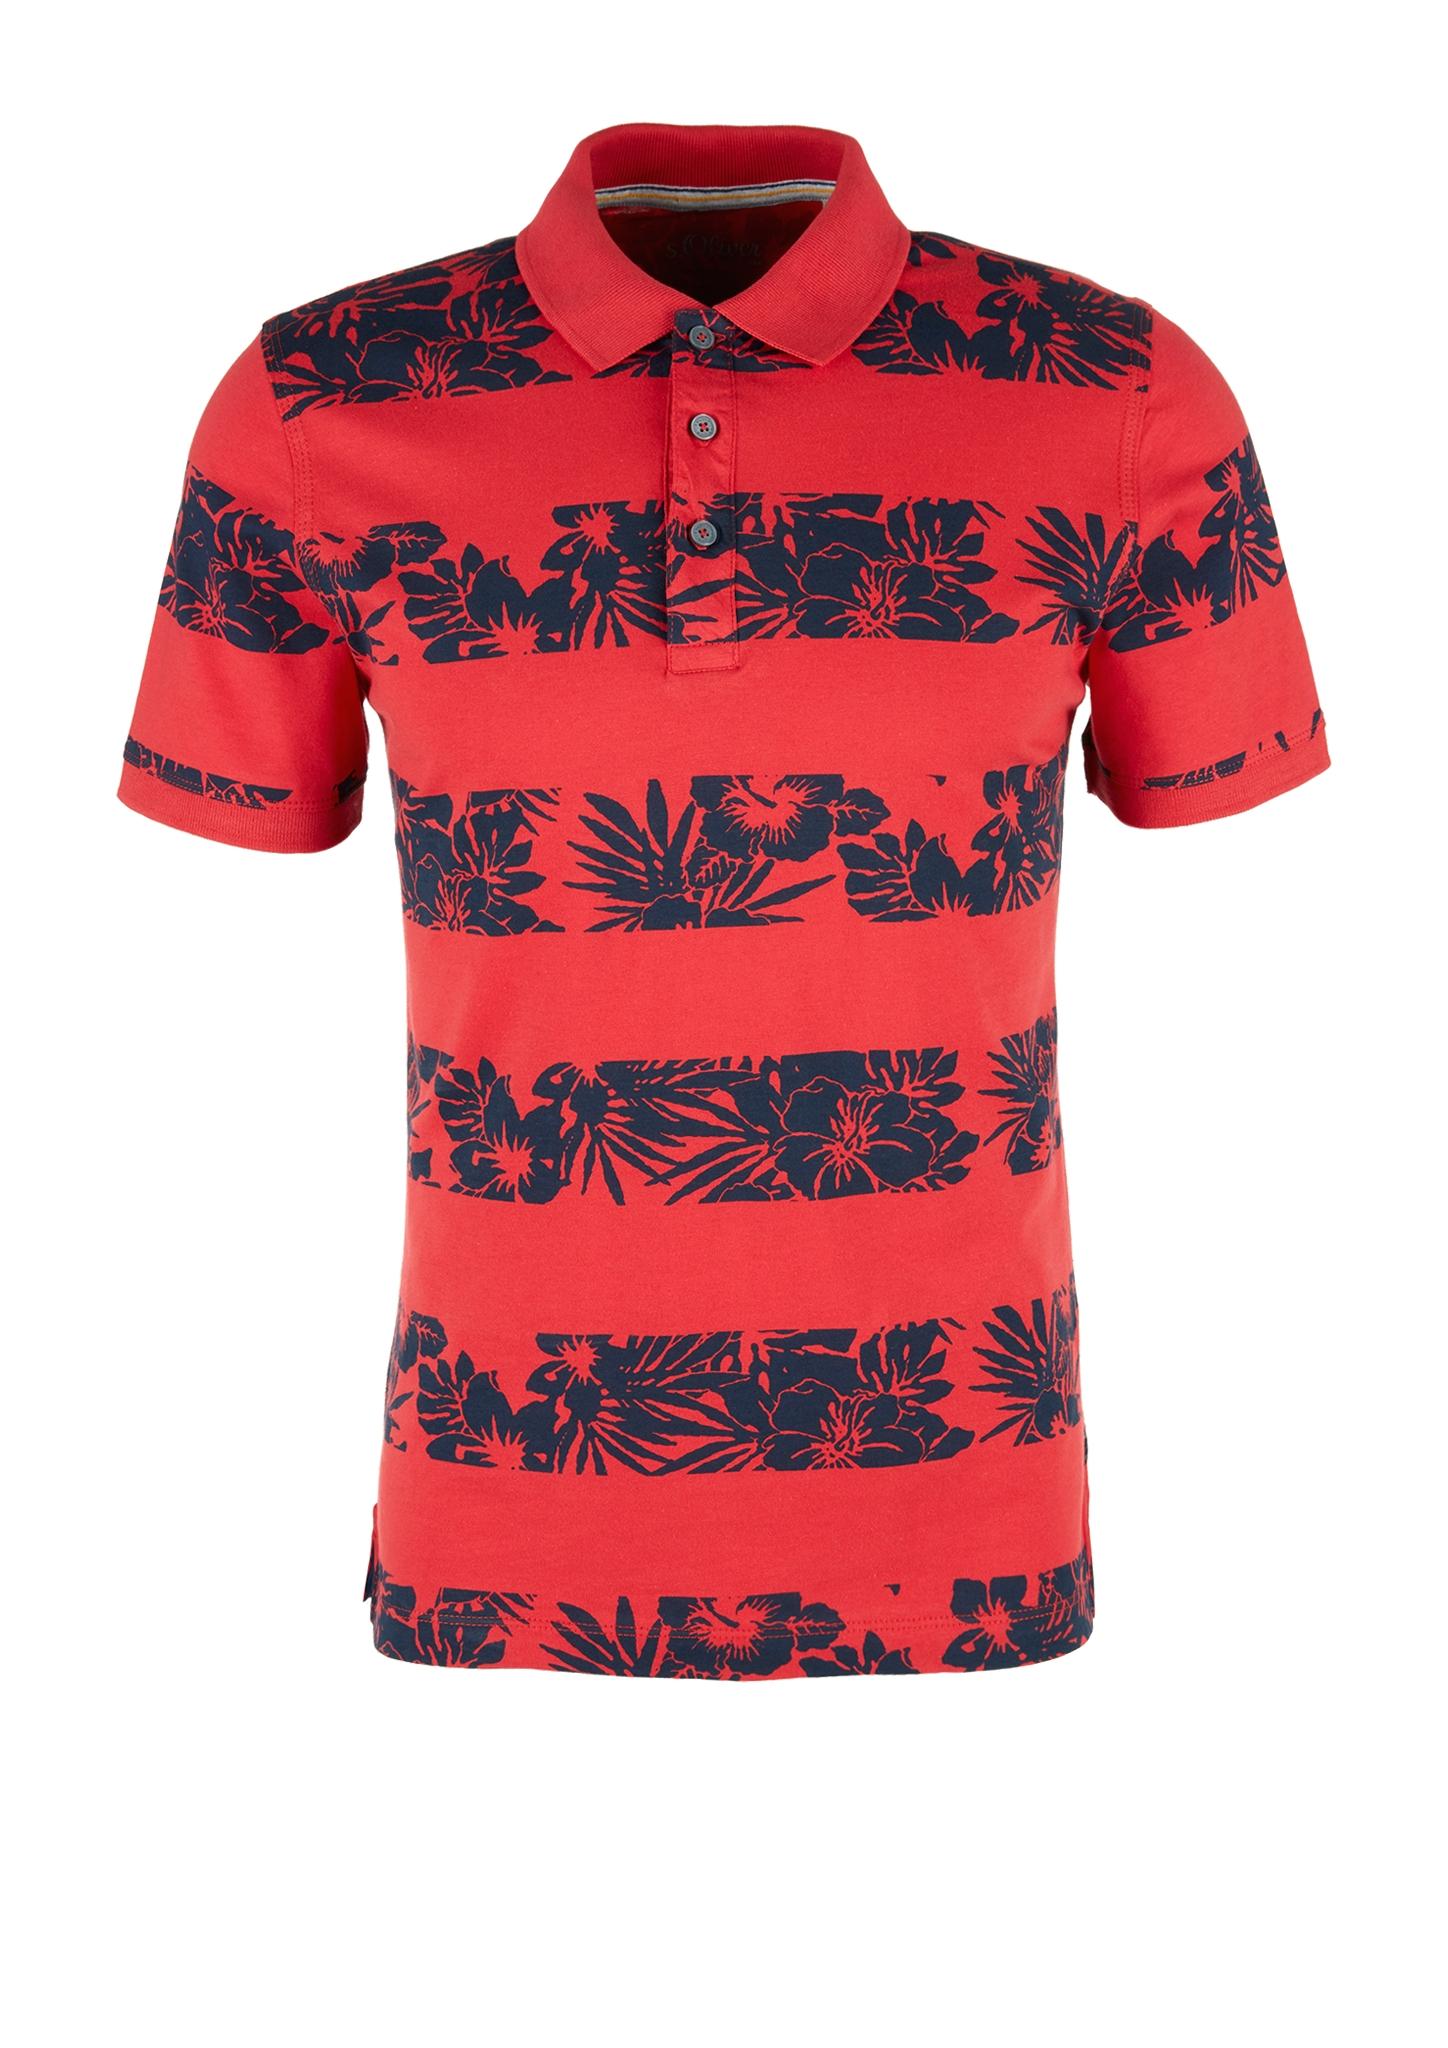 Poloshirt | Bekleidung > Polo Shirts > Kurzarm | Rot | 100% baumwolle | s.Oliver